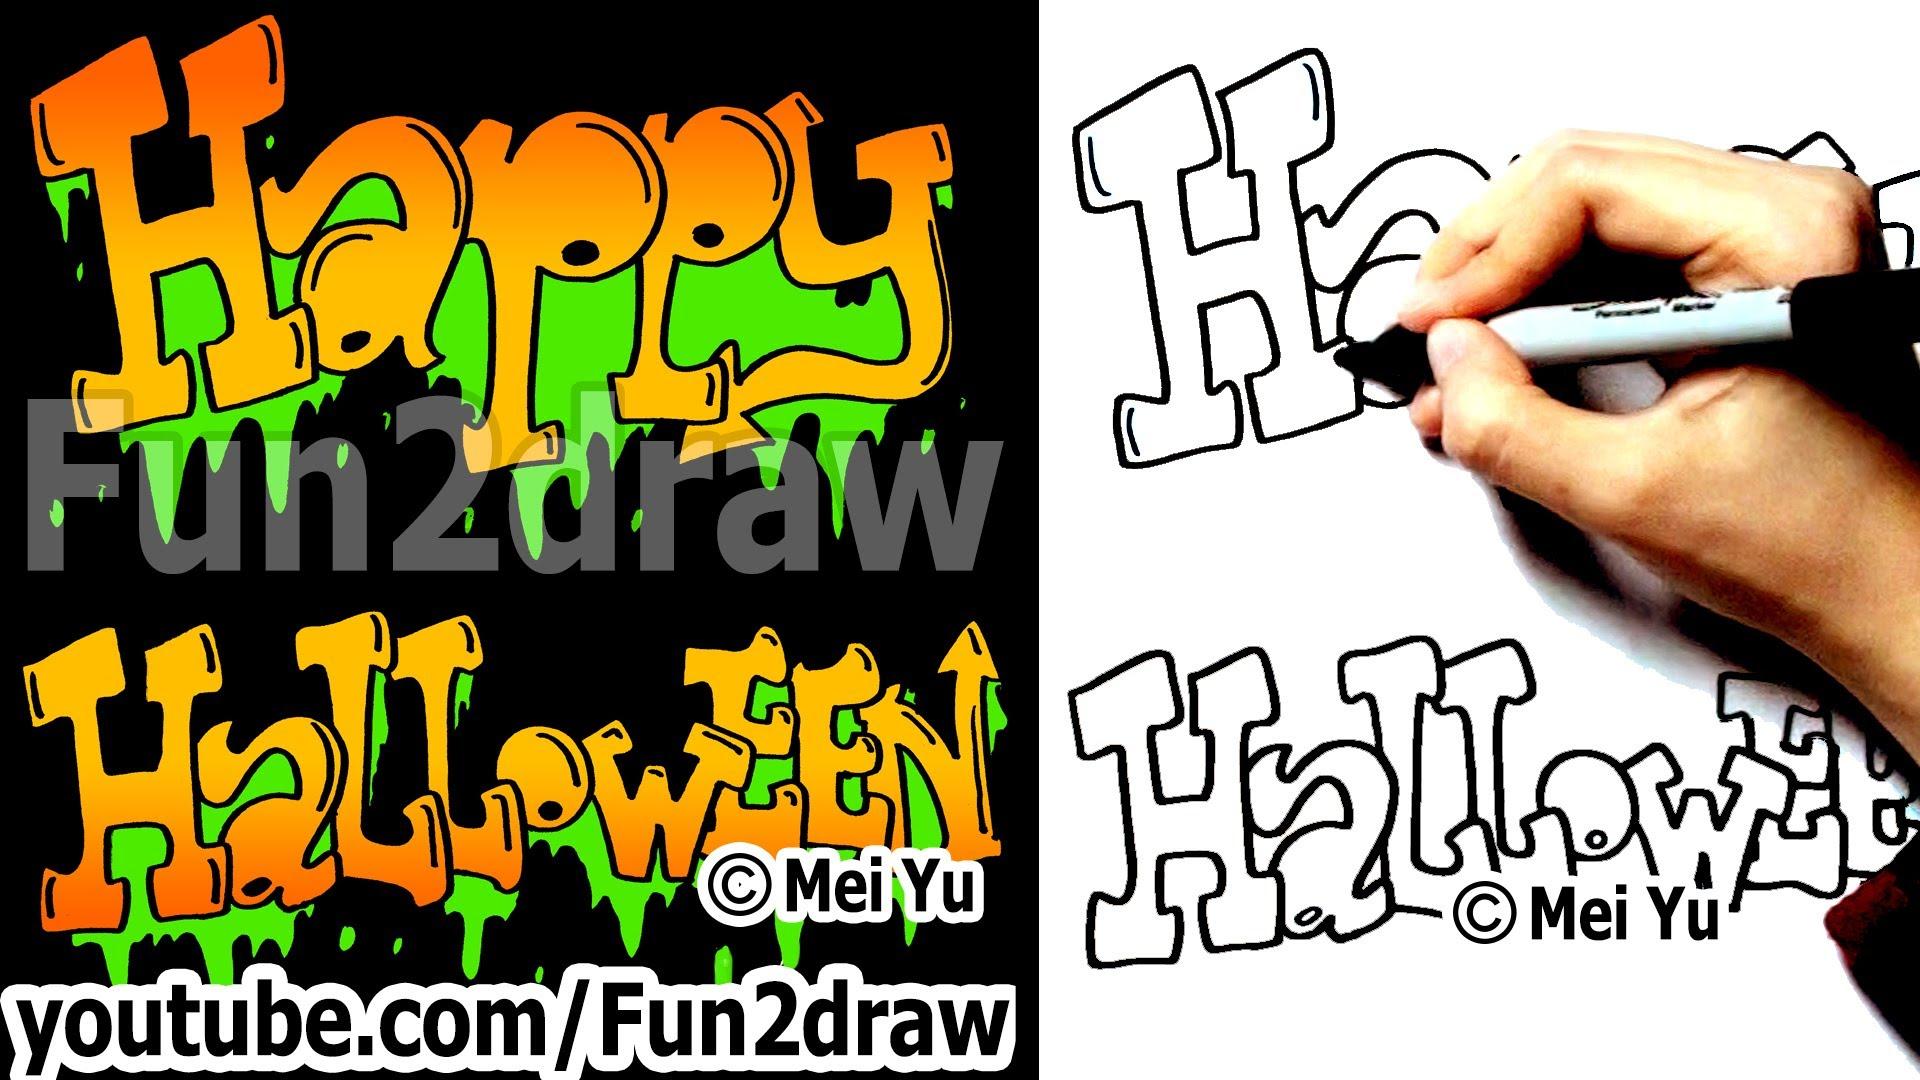 Drawn vampire graffiti Happy Things YouTube Fun Draw